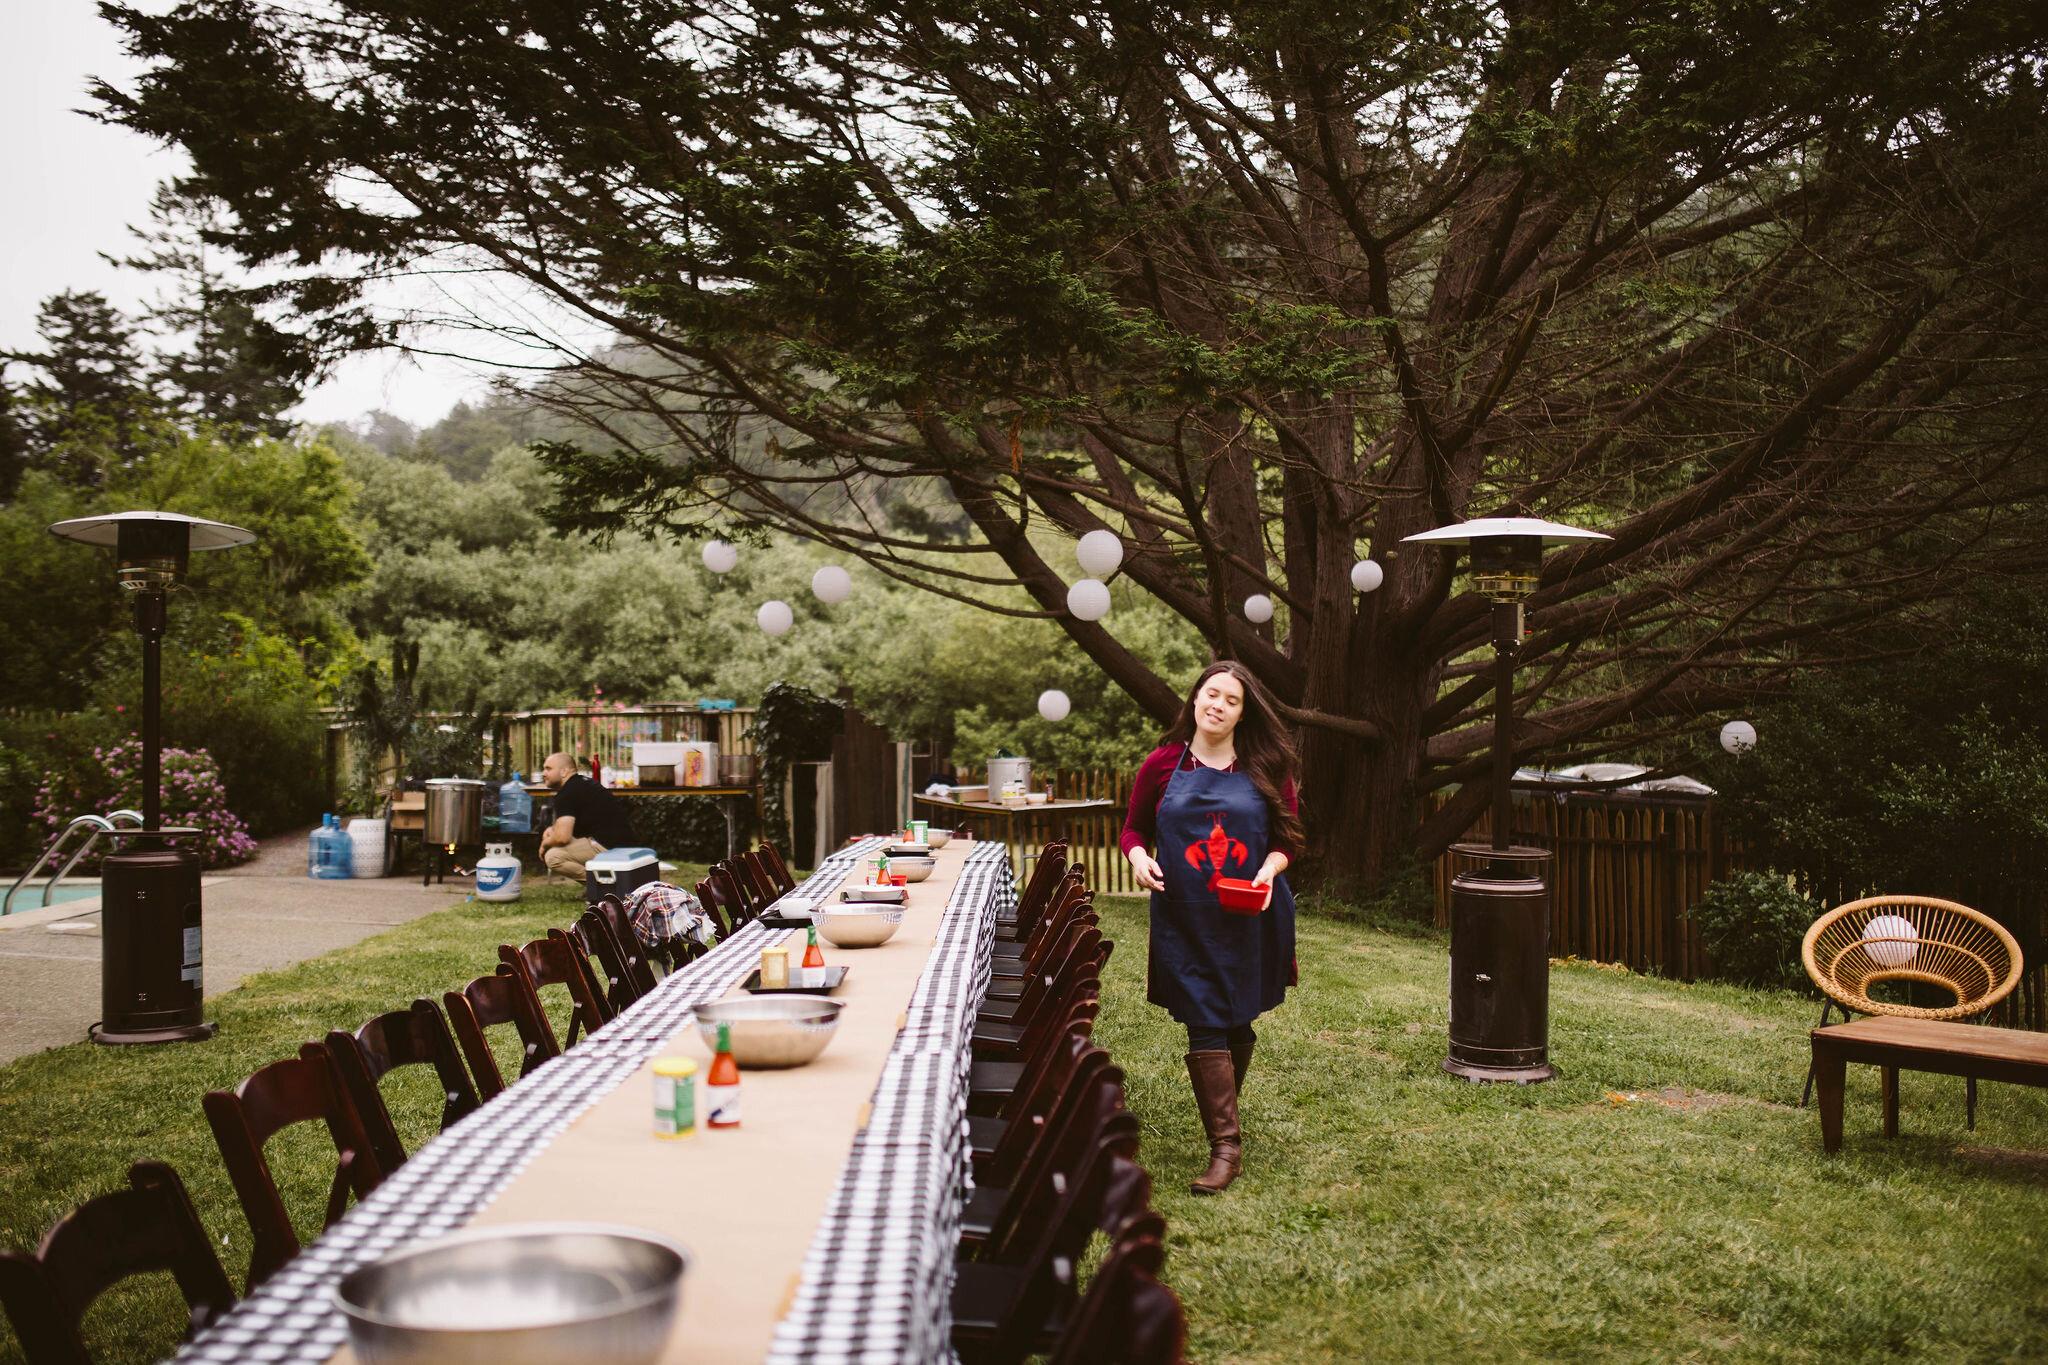 Venture-Retreat-Center-Wedding-Pescadero-Fri-Aaron-Pritam-The-Shalom-Imaginative-14.jpg